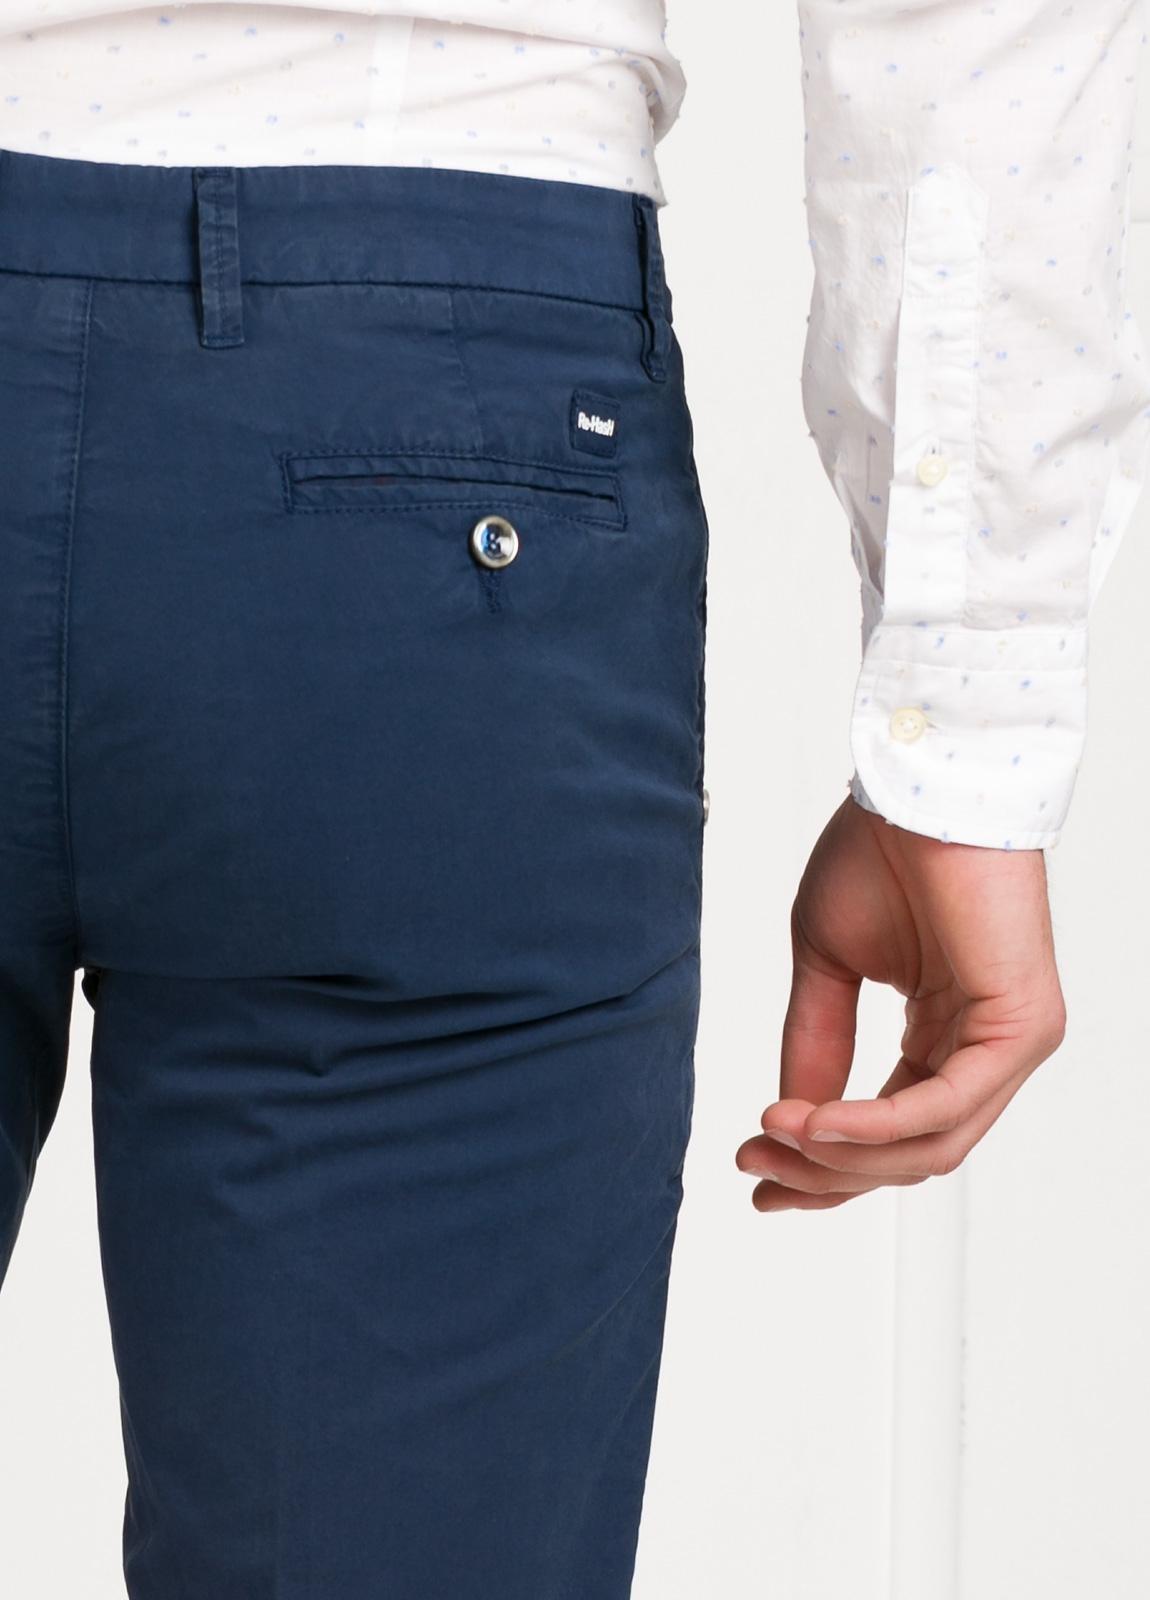 Pantalón sport modelo MUCHA P249 color azul. Algodón y elastáno. - Ítem2